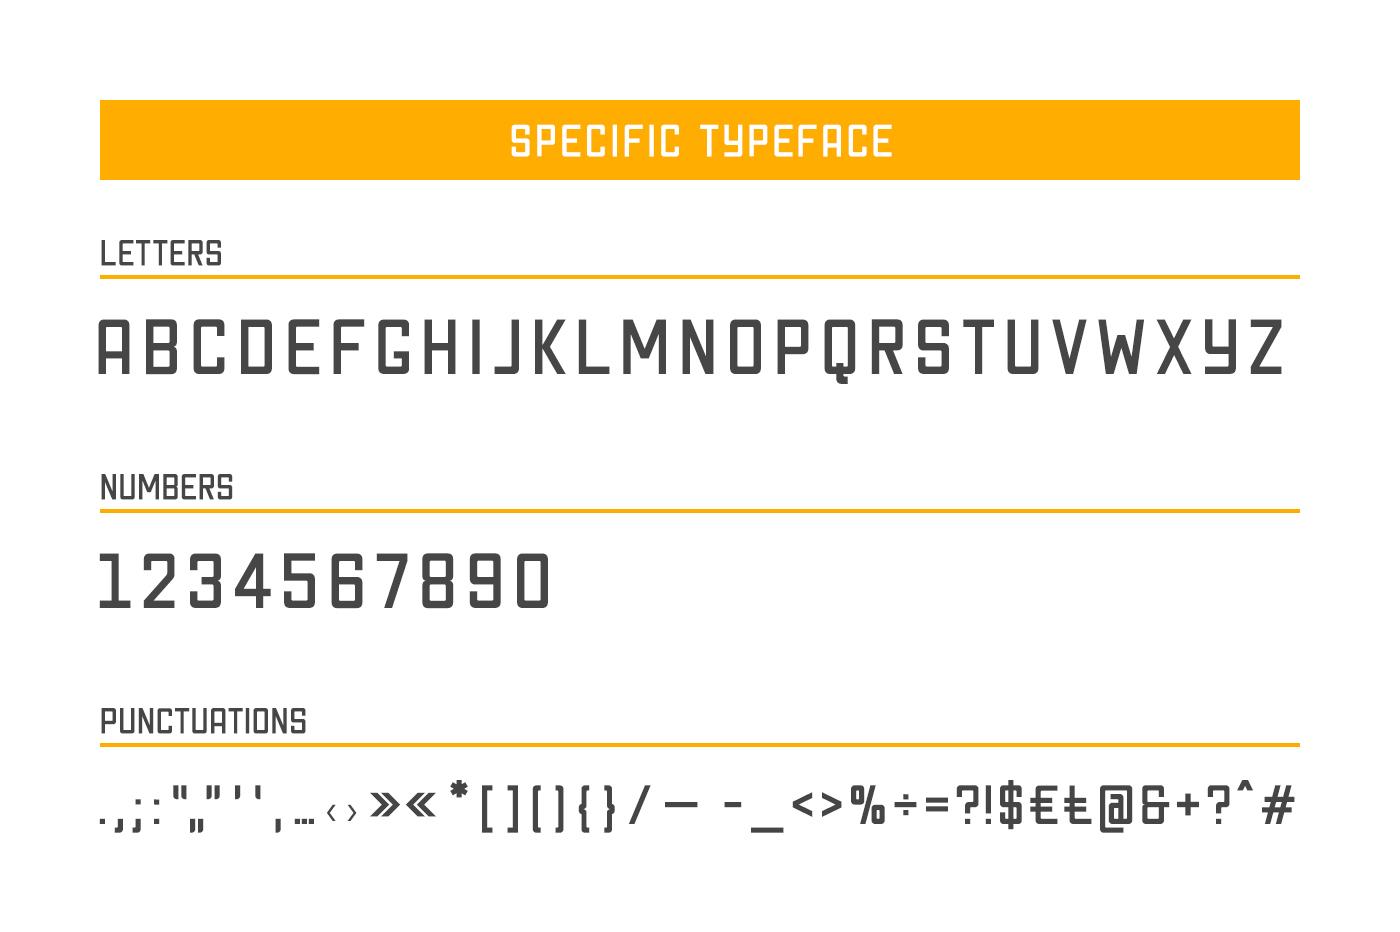 Specific Typeface